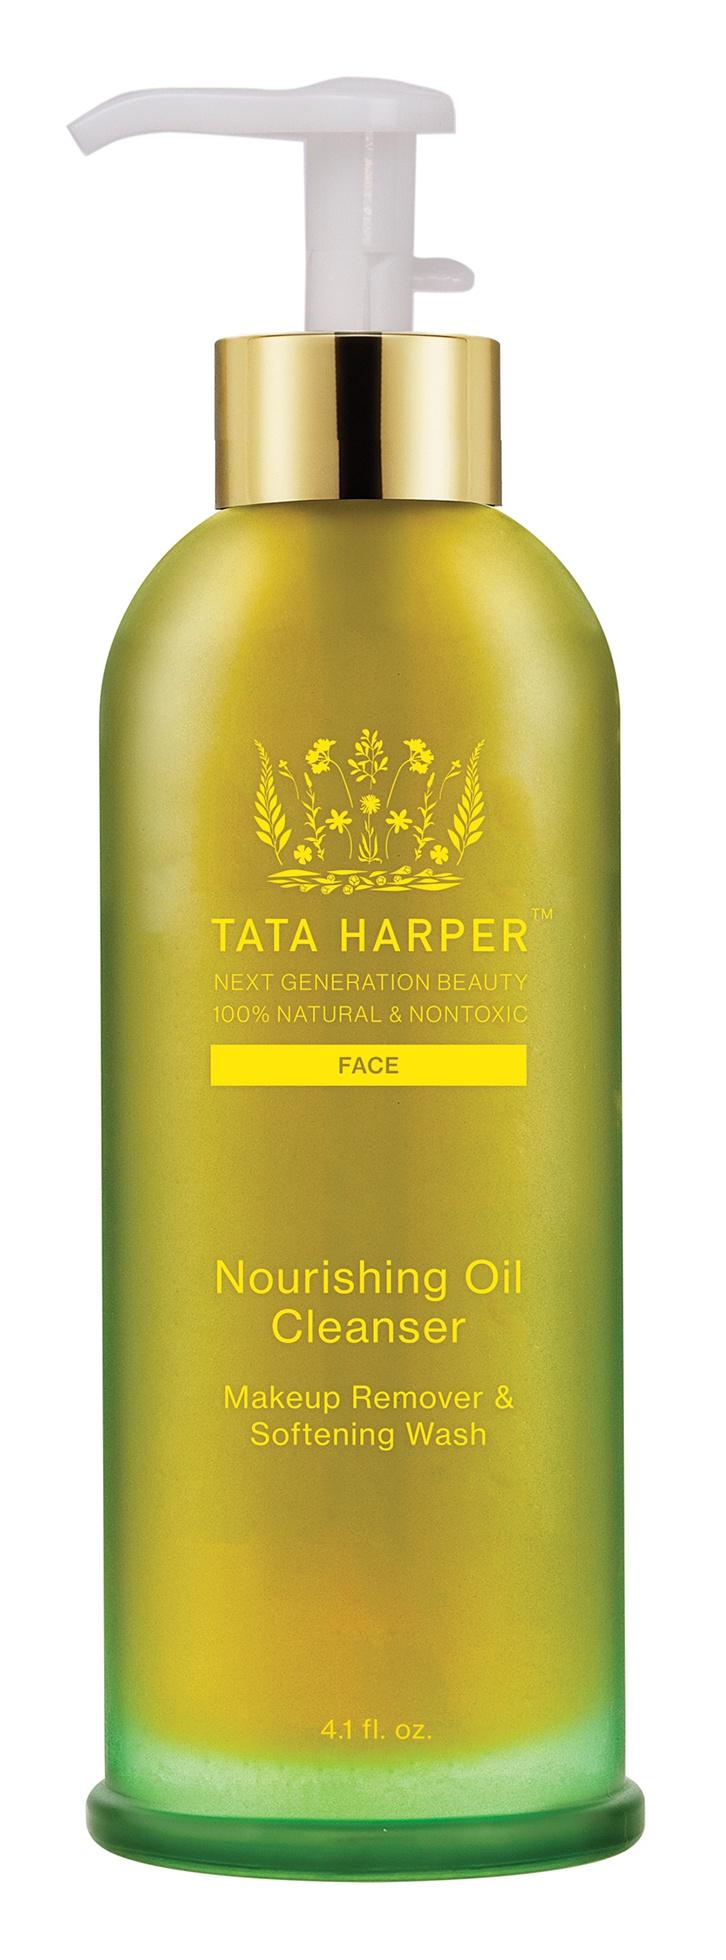 Tata Harper Nourishing Makeup Removing Oil Cleanser